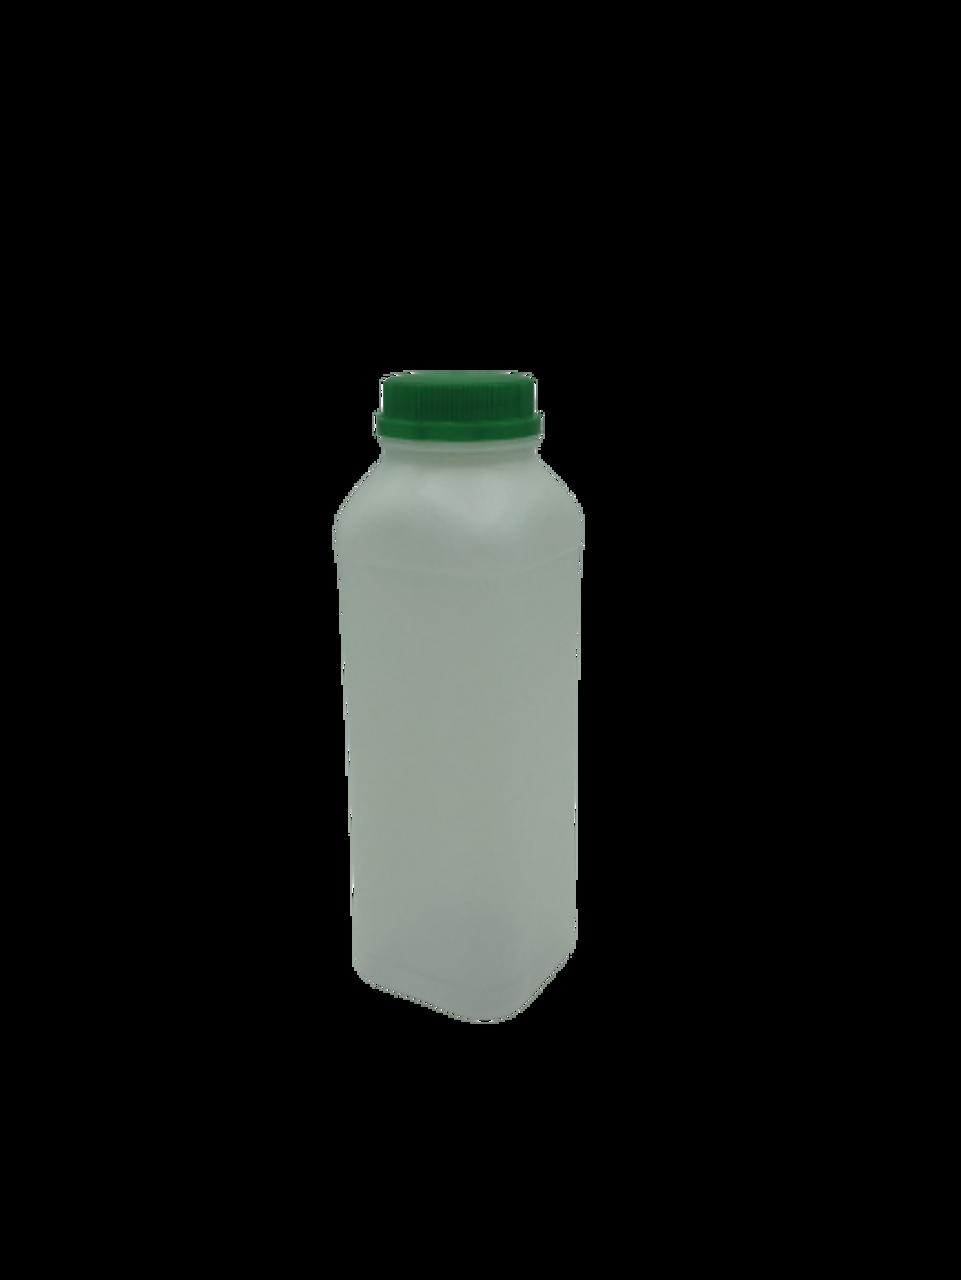 Natural HDPE Milk/Juice Bottles